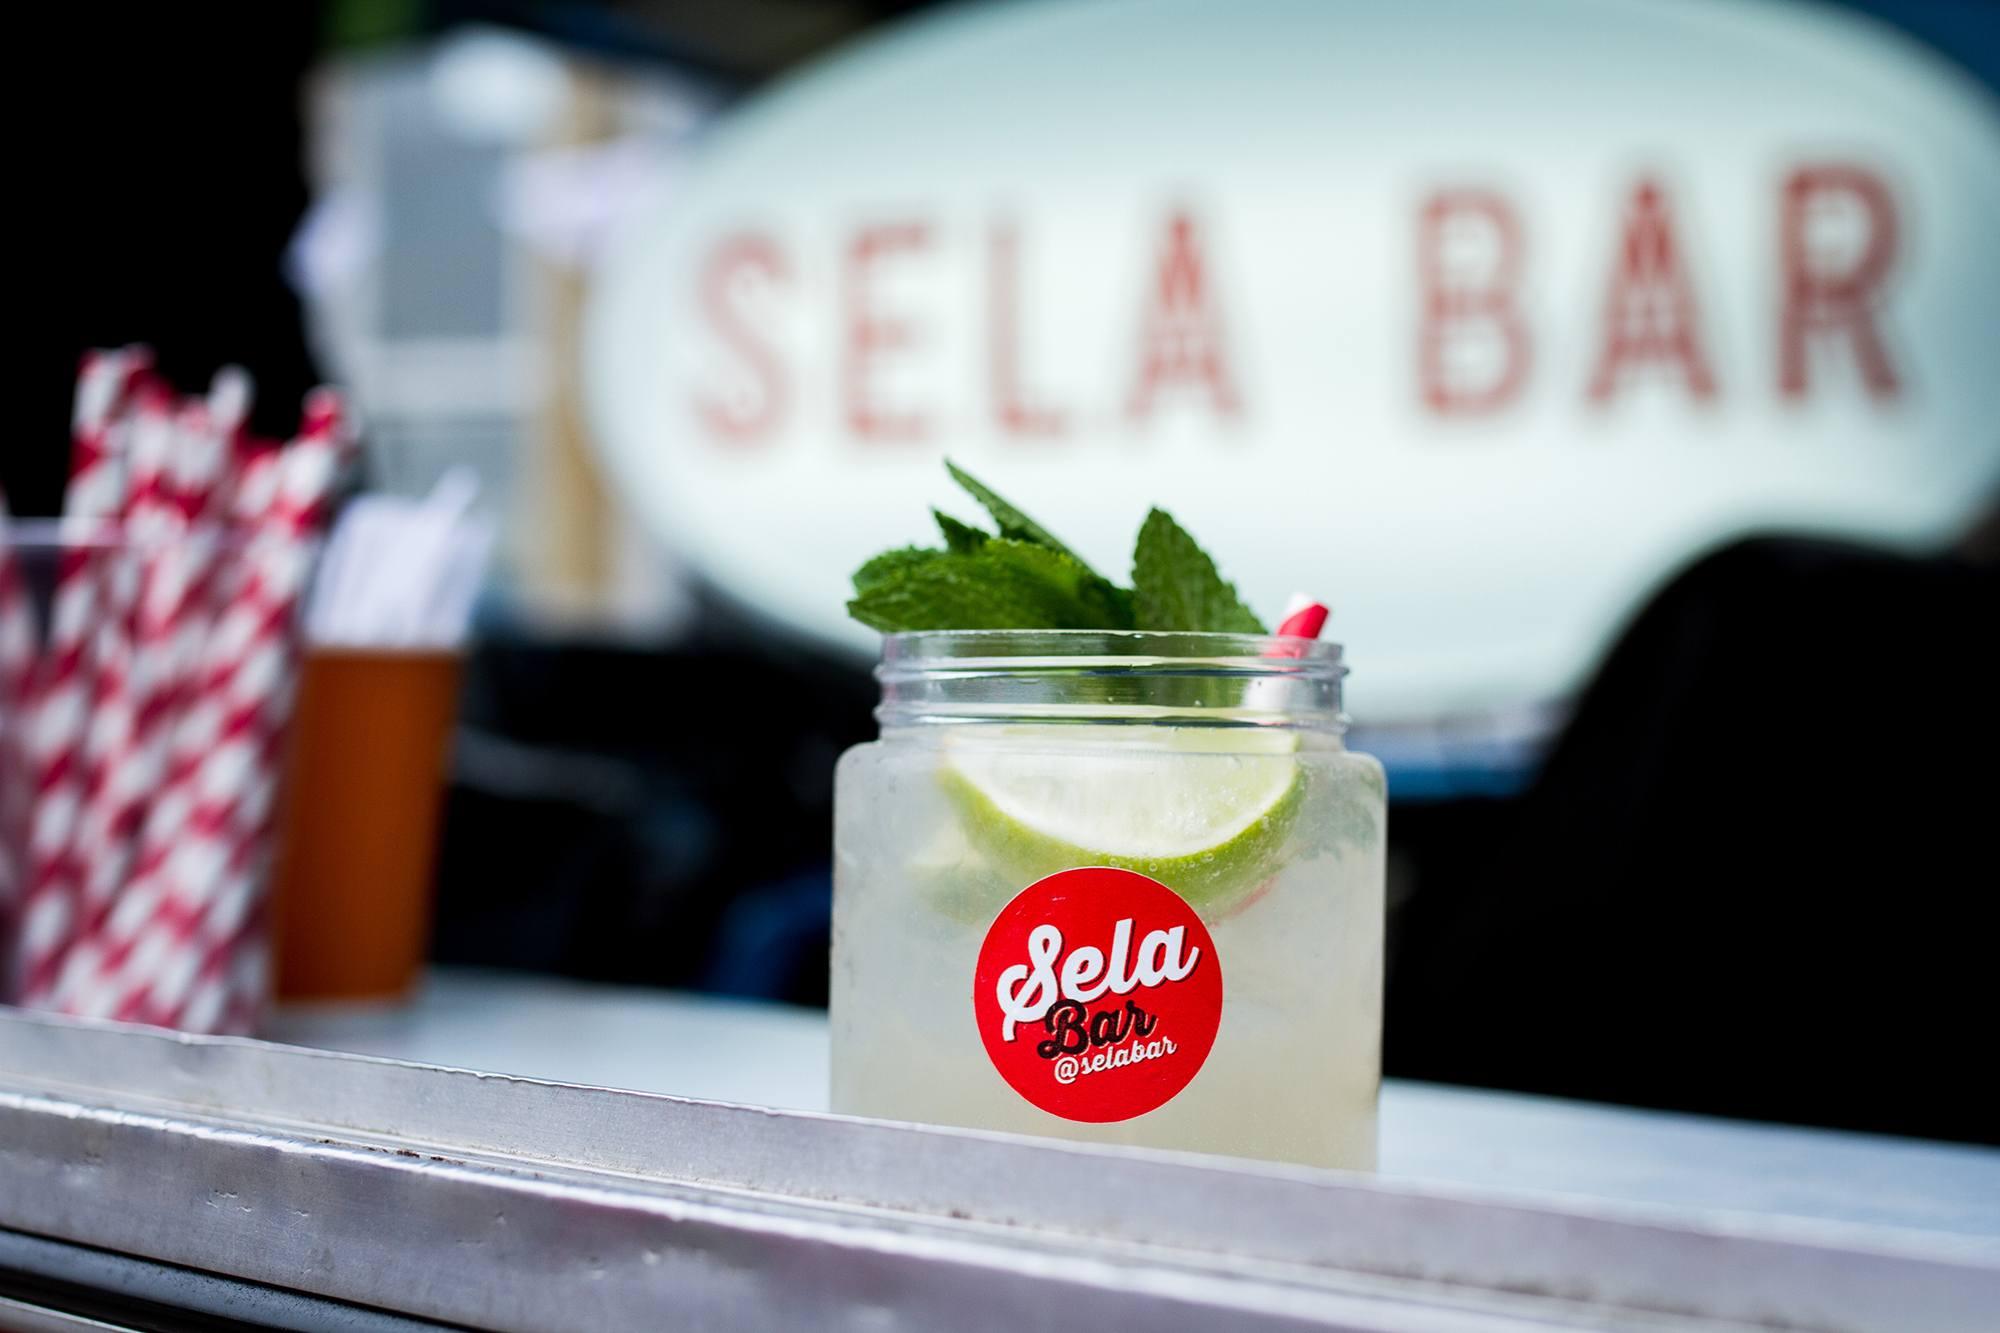 Sela Bar LIF-School-Dinner-Chapel Allerton-primary-credit-Jessie-Leong